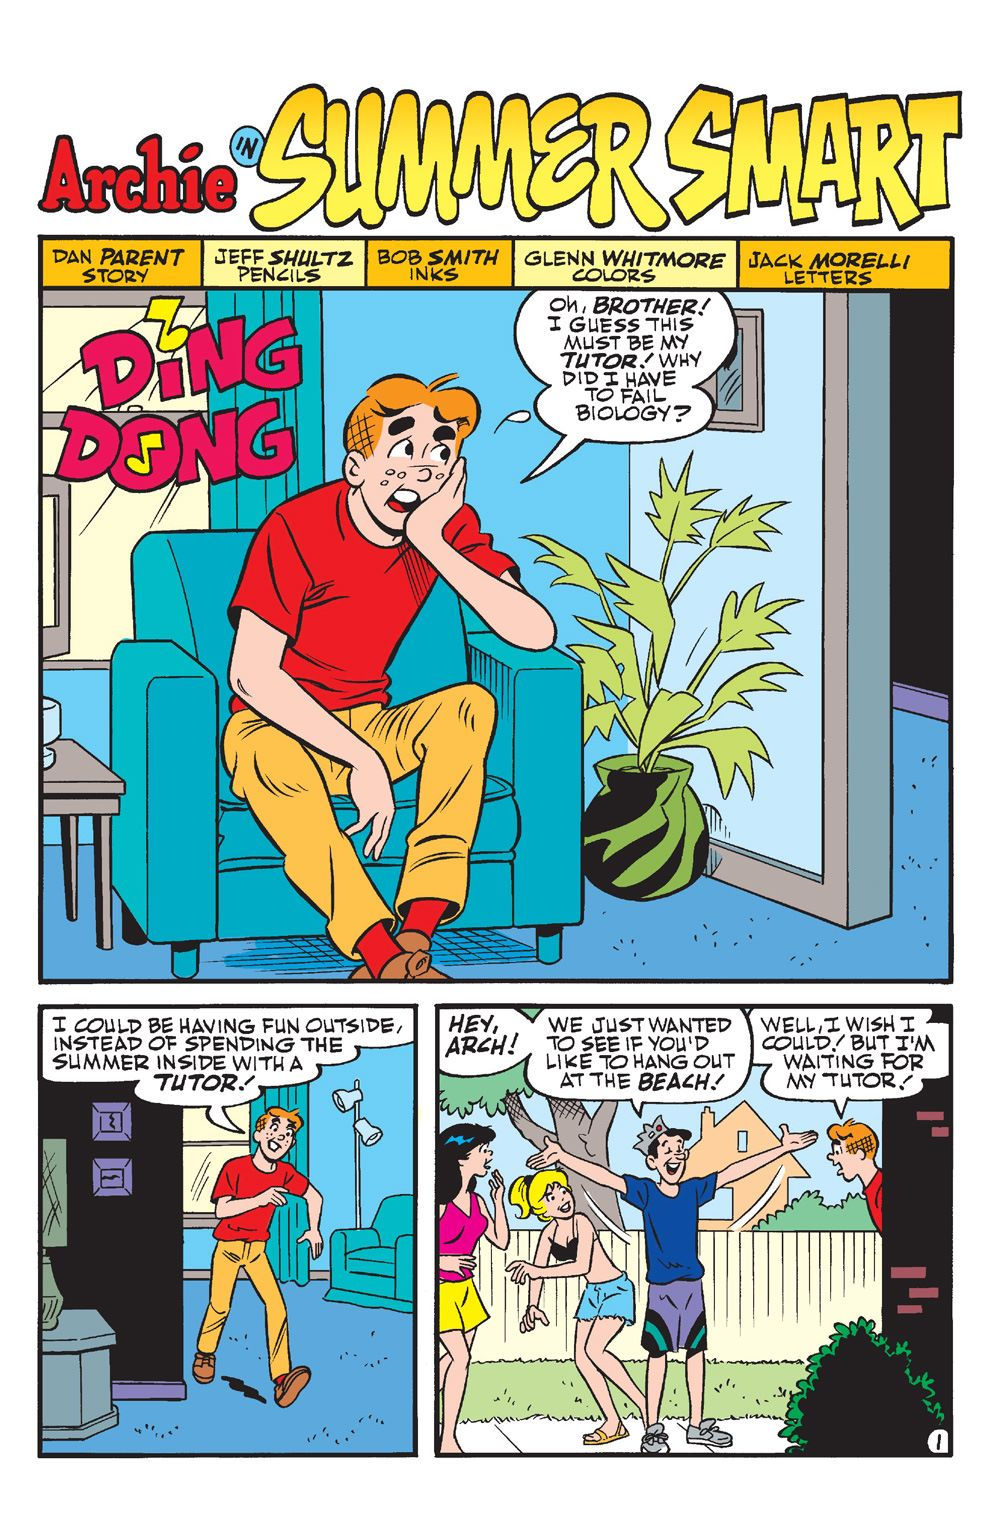 ArchieAndFriends-SummerVacation-18 ComicList Previews: ARCHIE AND FRIENDS SUMMER VACATION #1